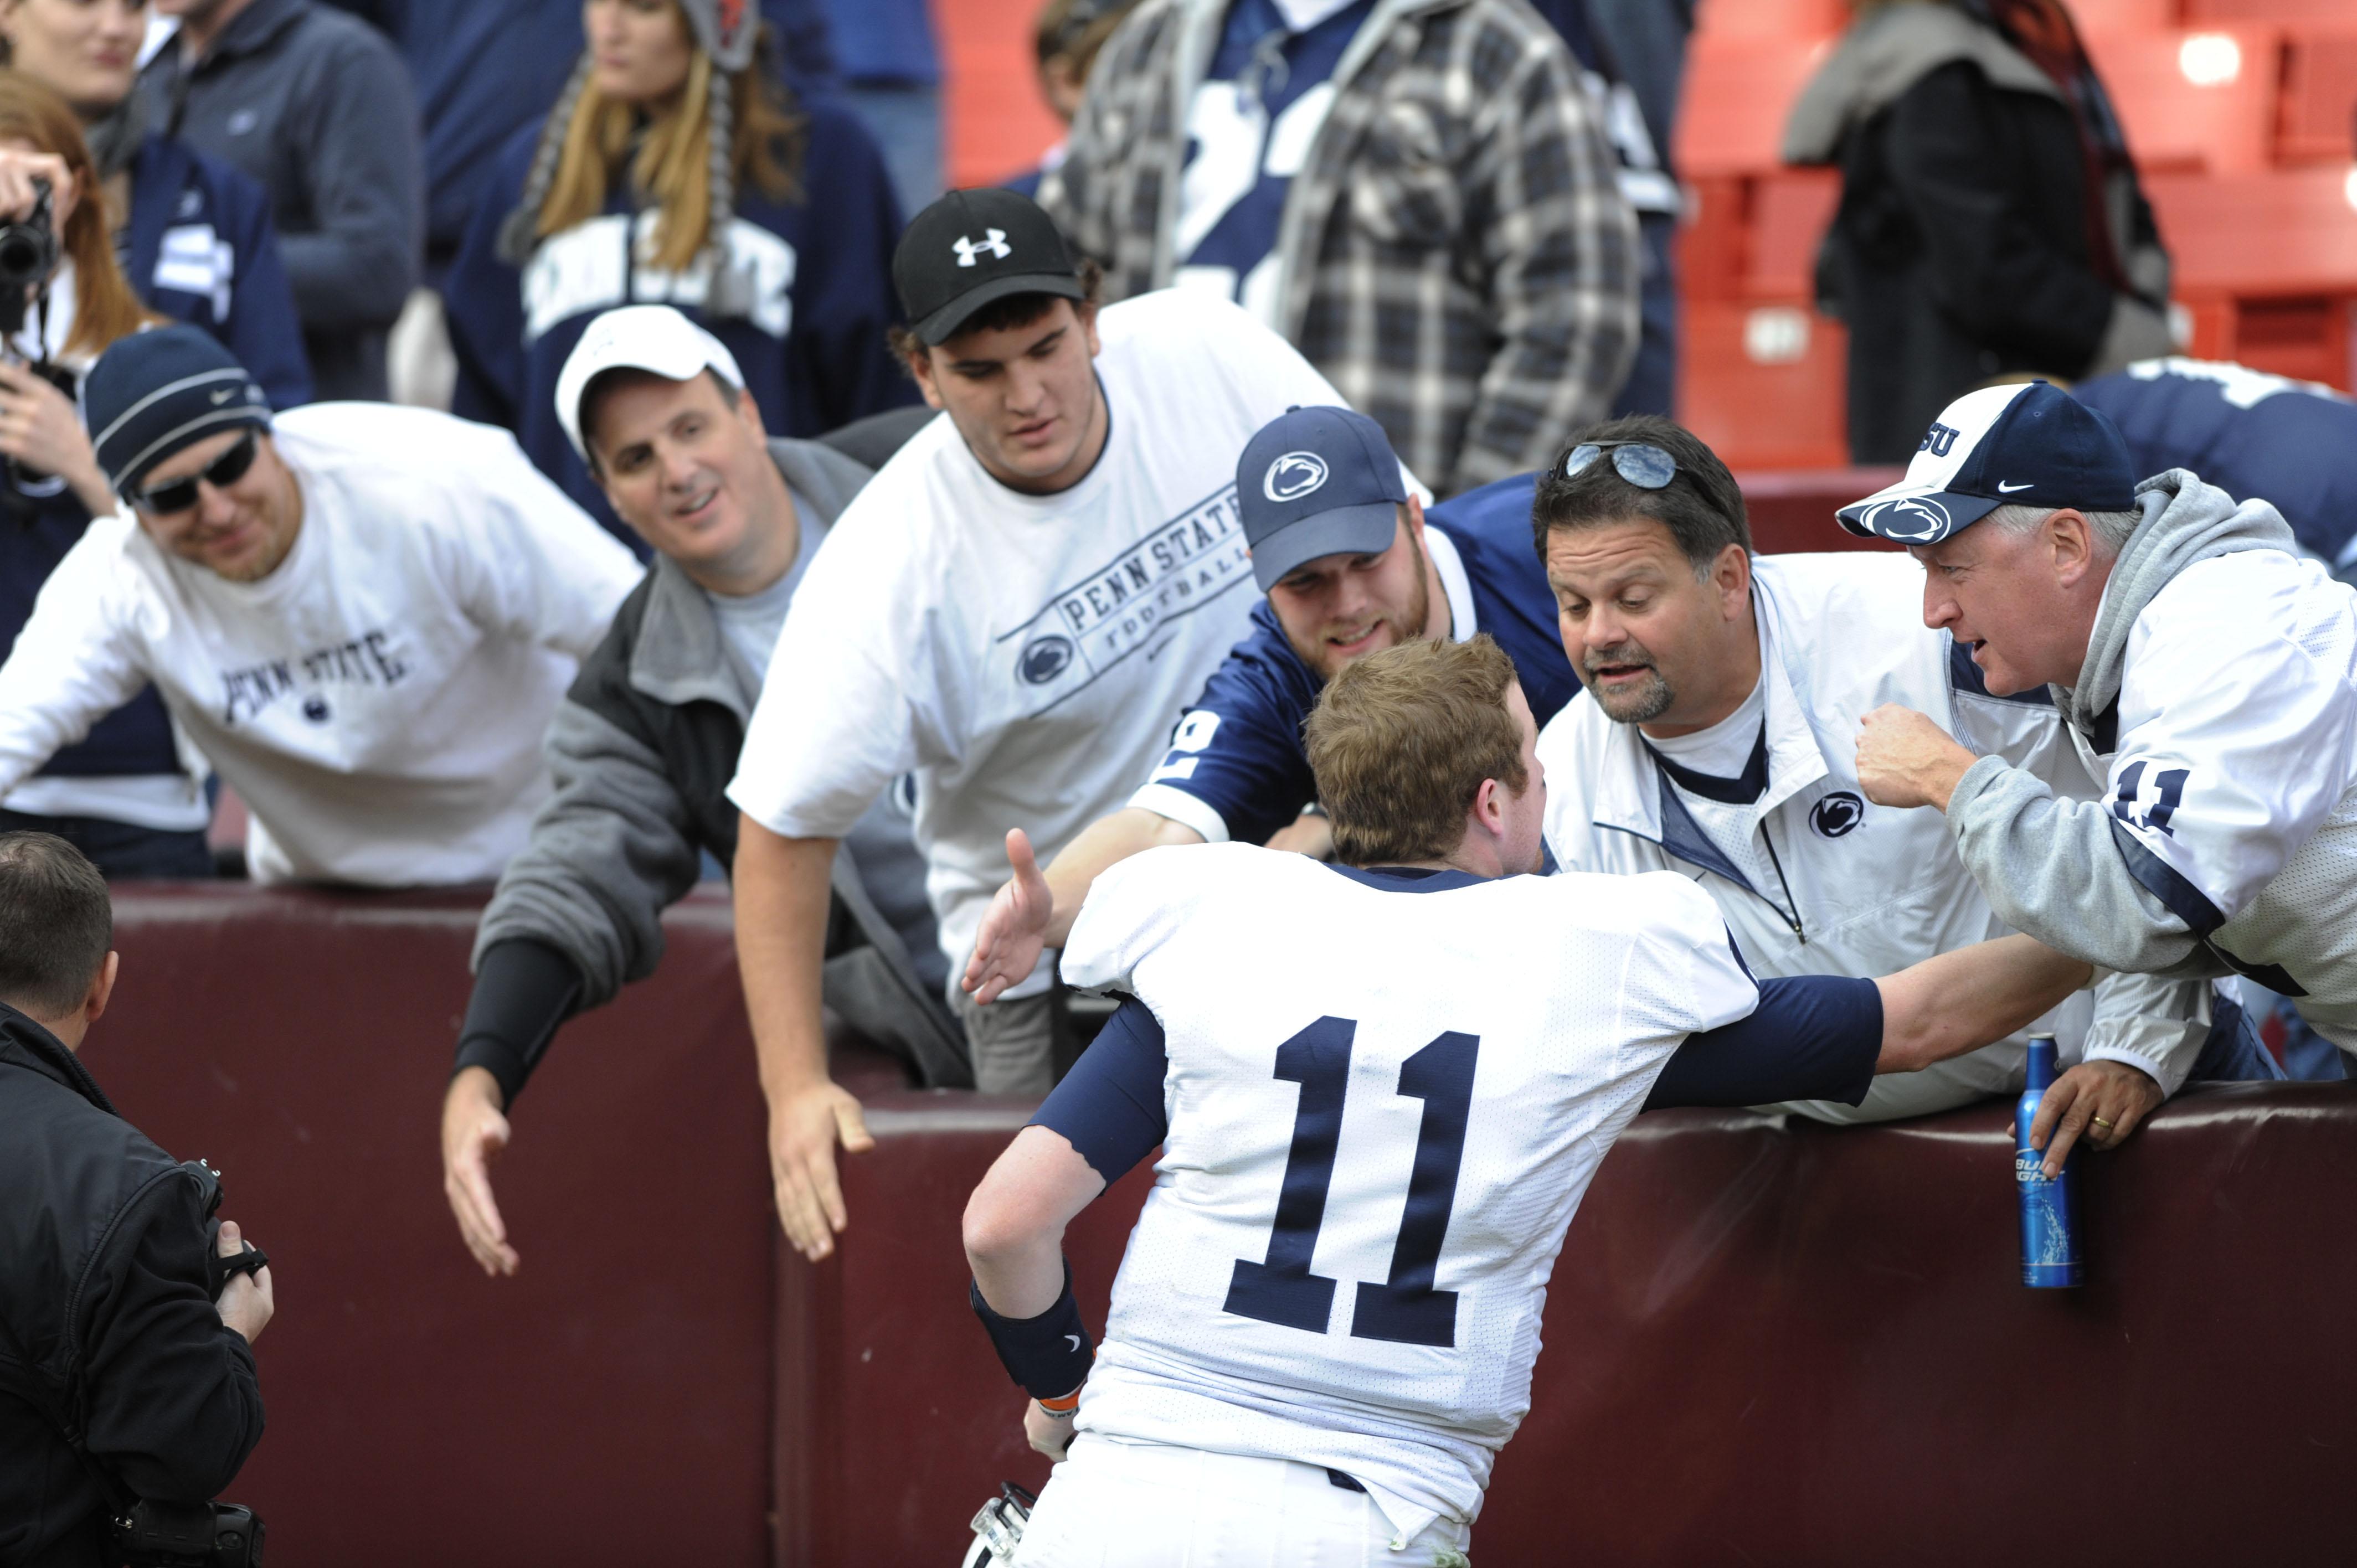 Penn State v Indiana  (Photo by Steve Manuel)